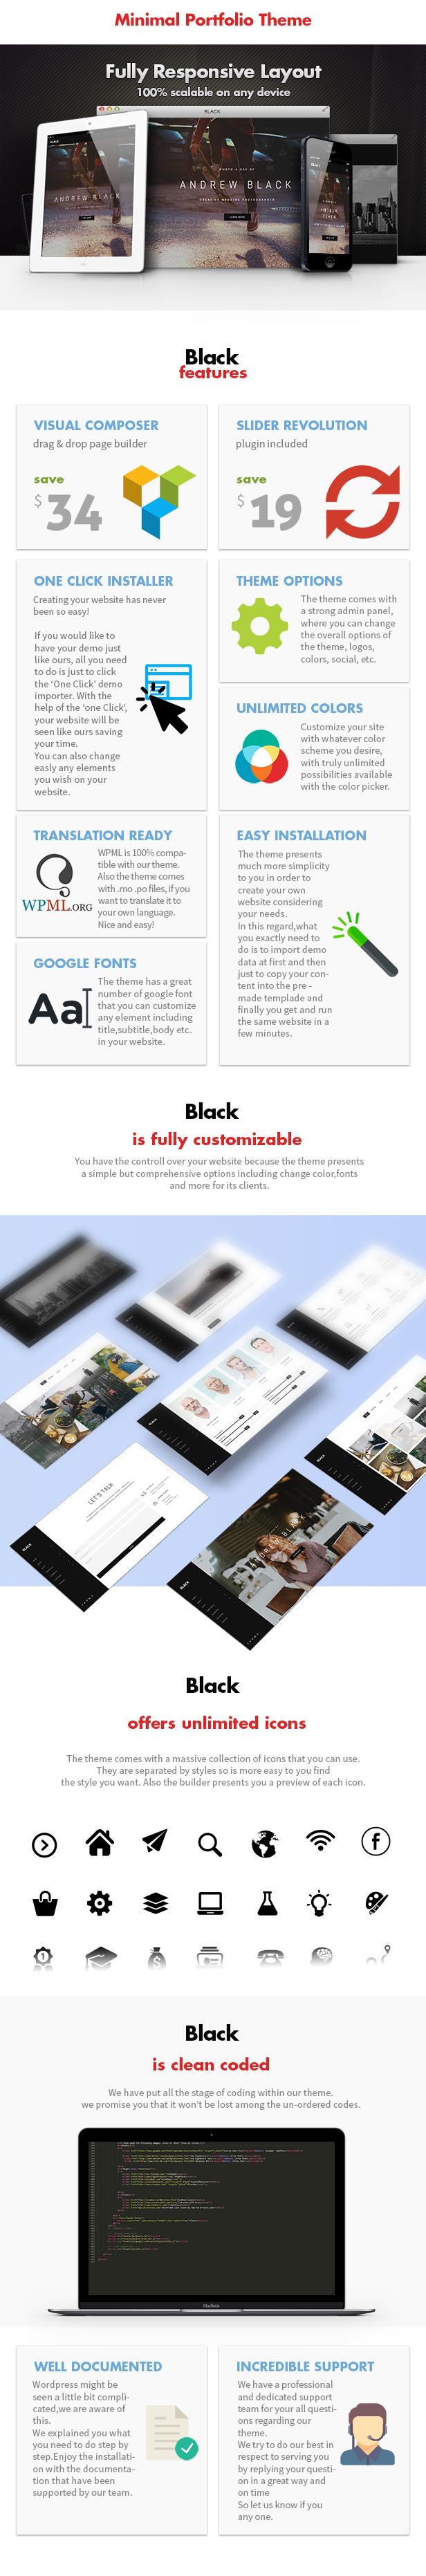 Schwarz - Minimal Portfolio WordPress Vorlage - 7